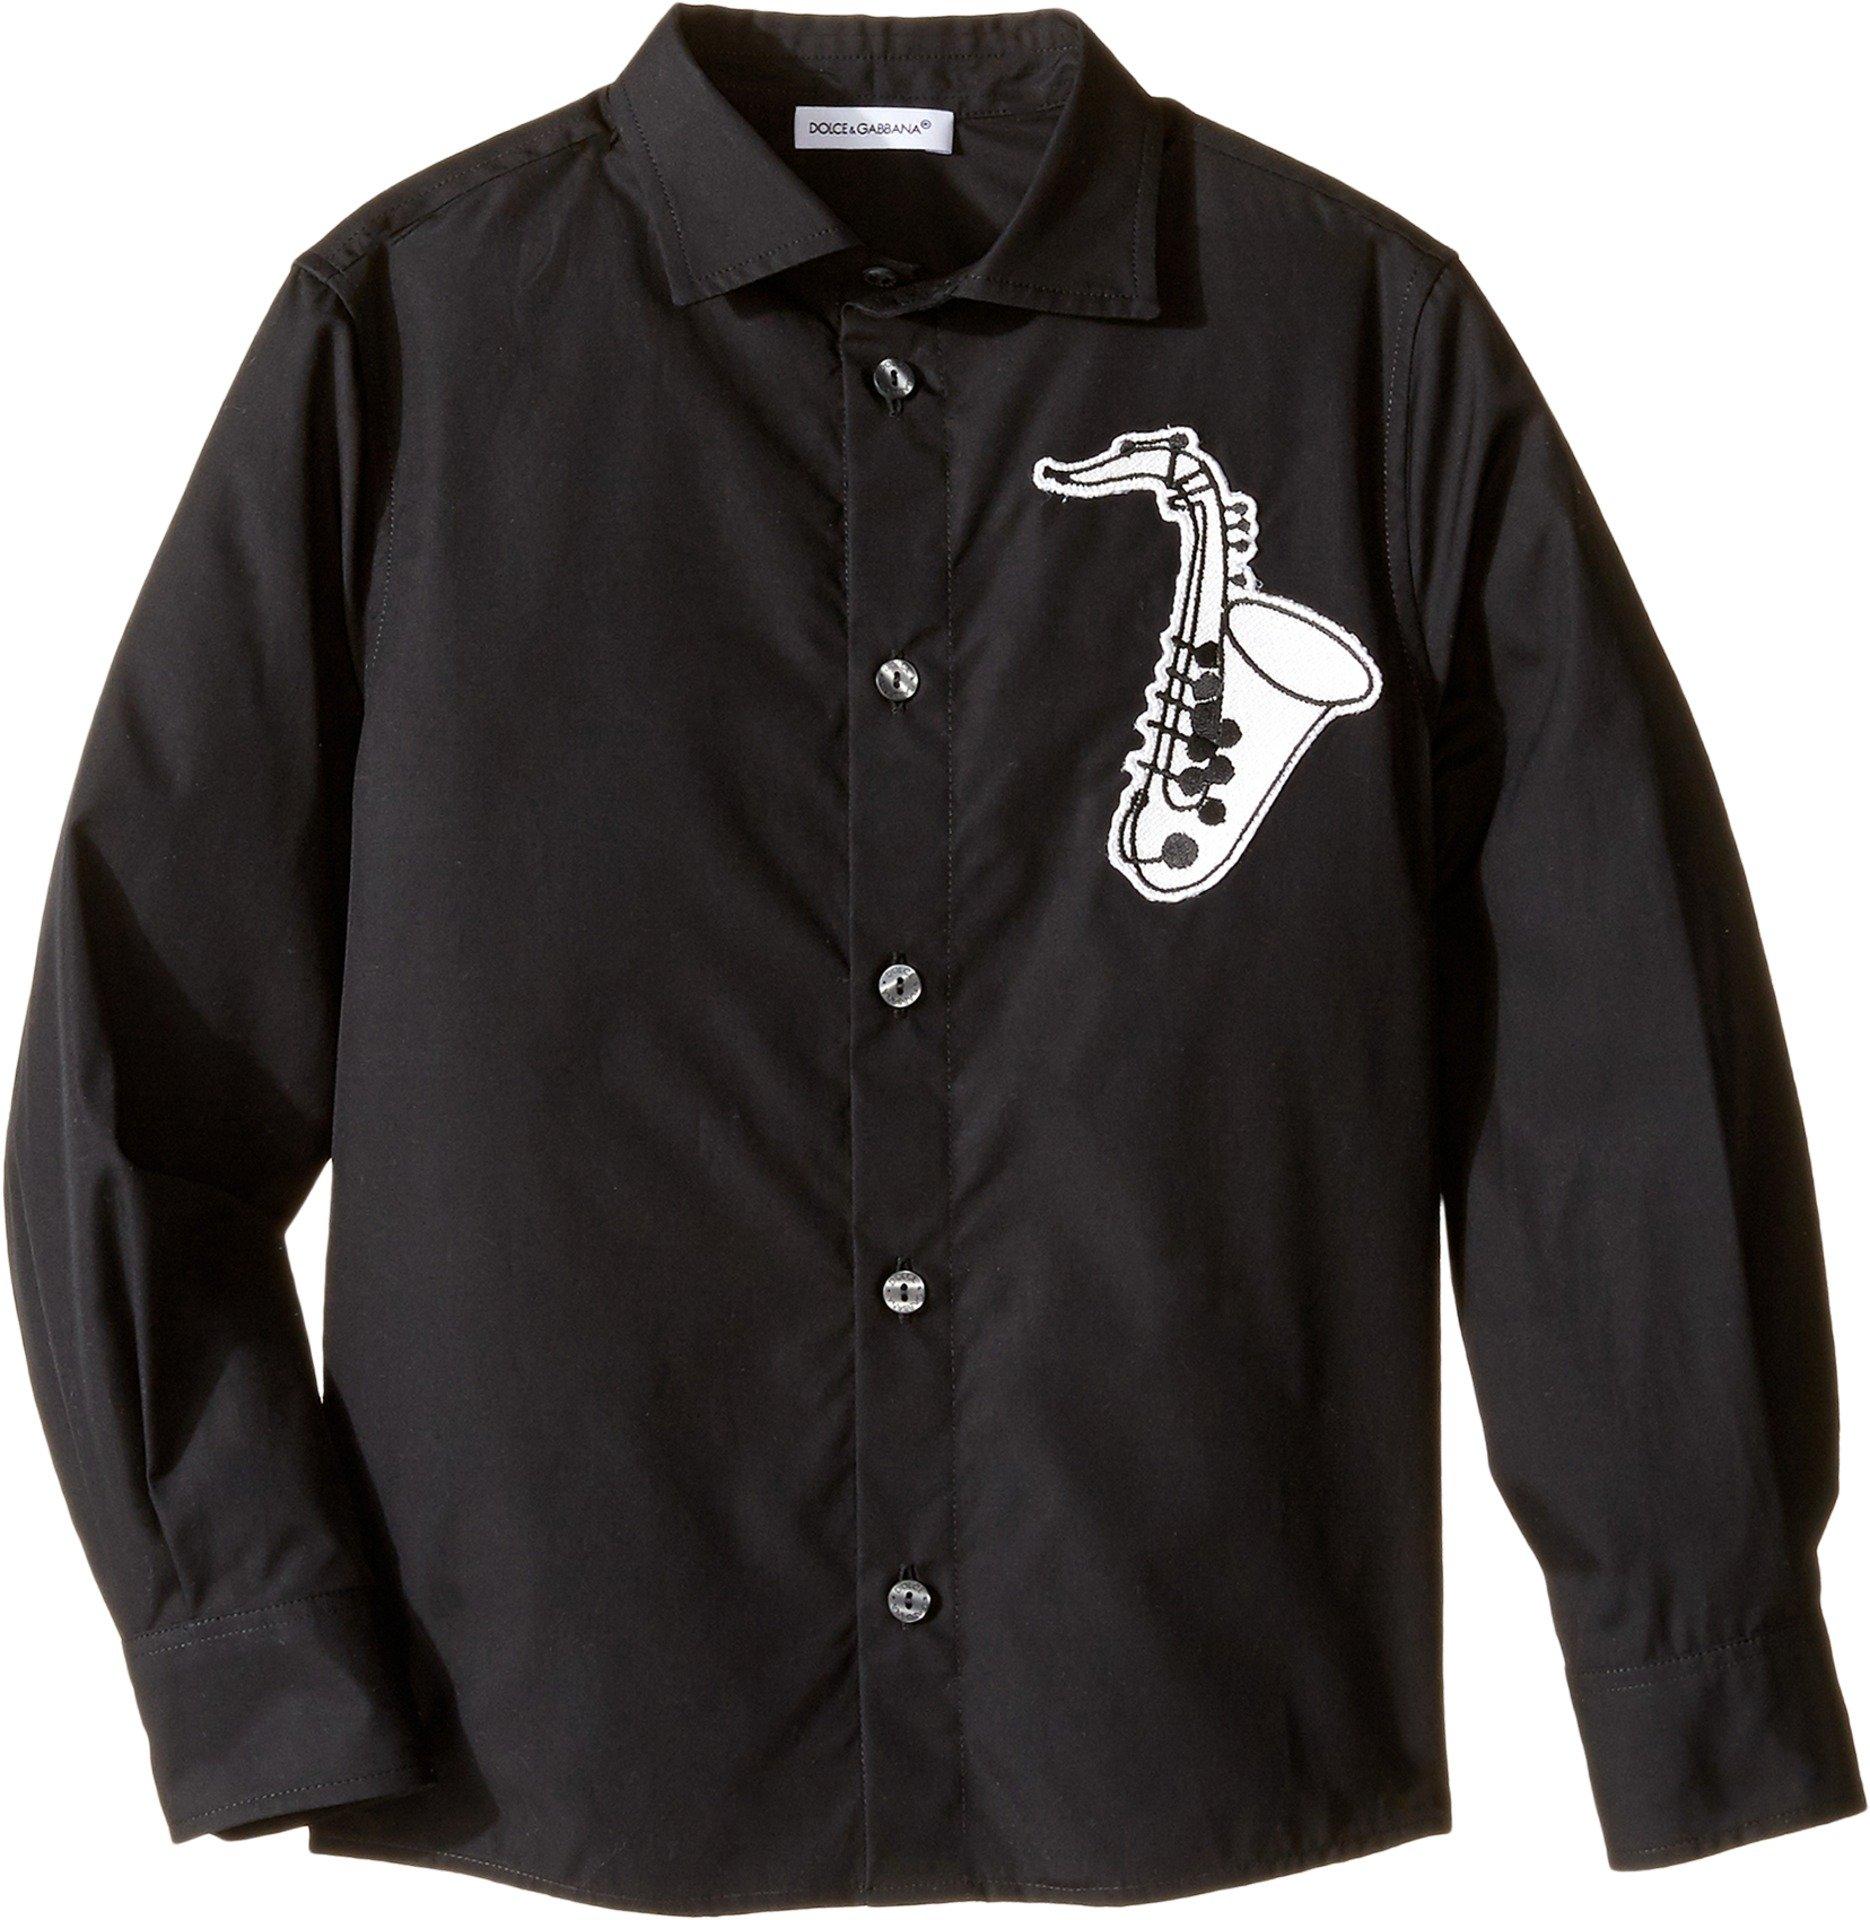 Dolce & Gabbana Kids Baby Boy's Saxophone Button Up (Toddler/Little Kids) Black Button-up Shirt by Dolce & Gabbana